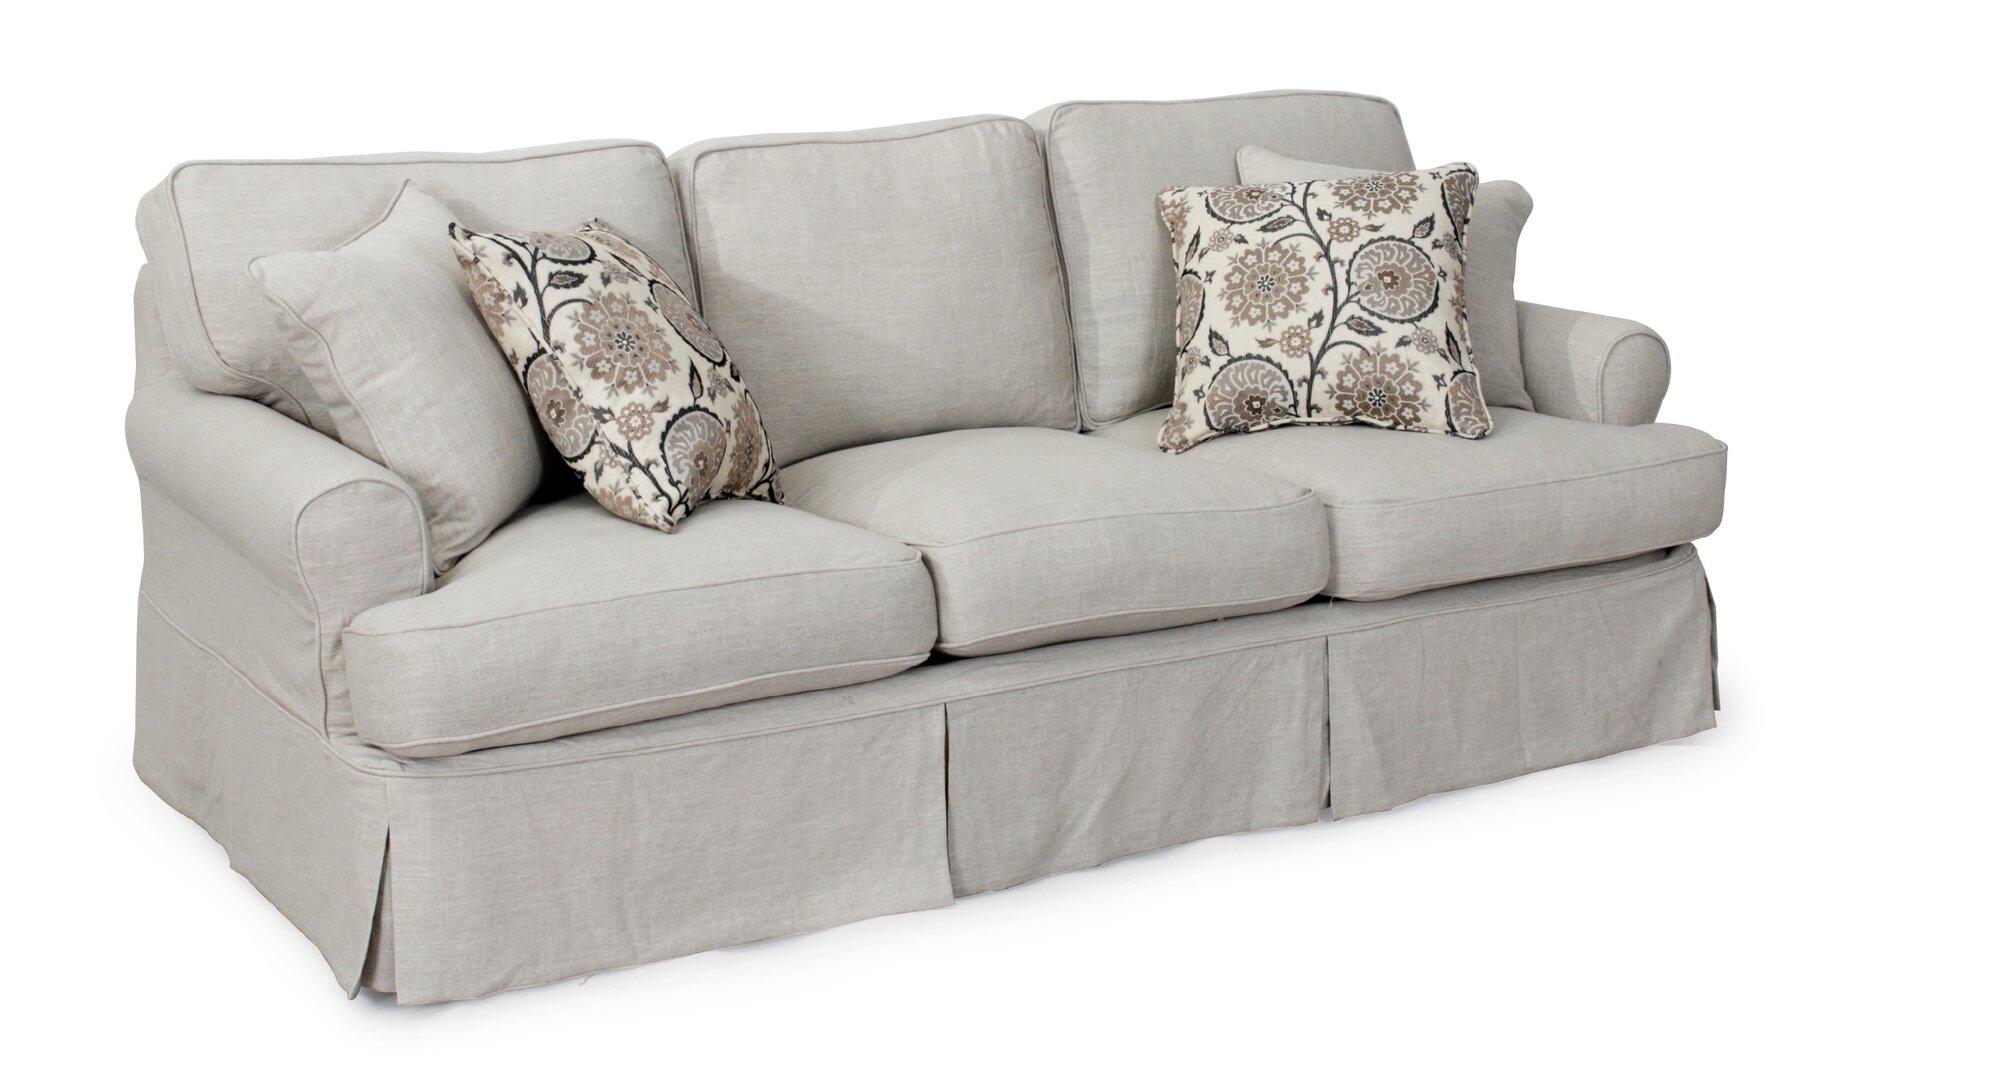 August Grove Callie T Cushion Sofa Slipcover Set AGGR1859